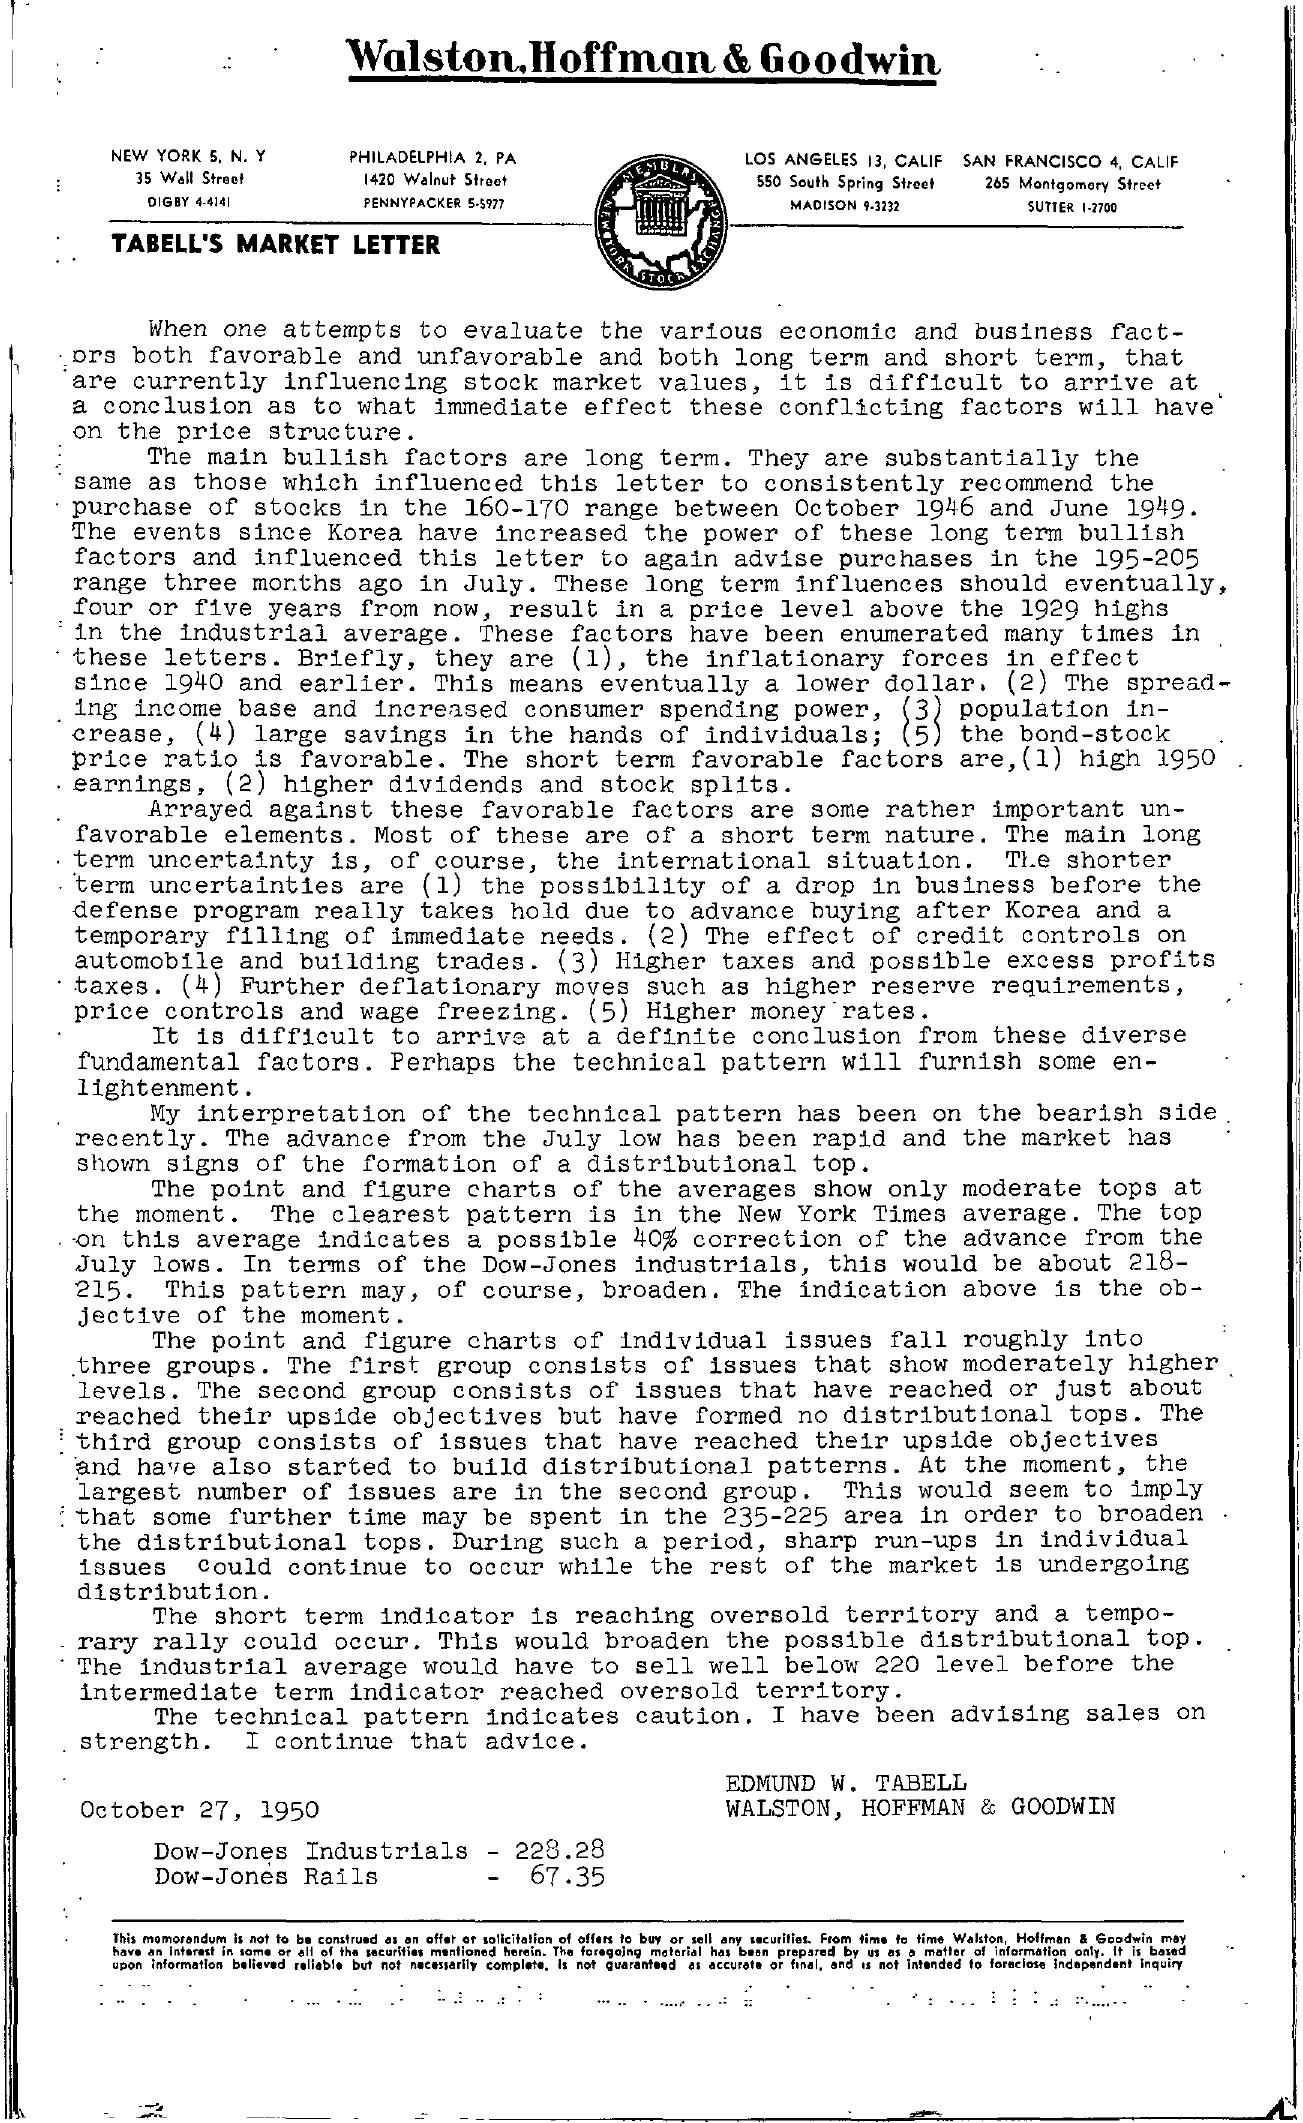 Tabell's Market Letter - October 27, 1950